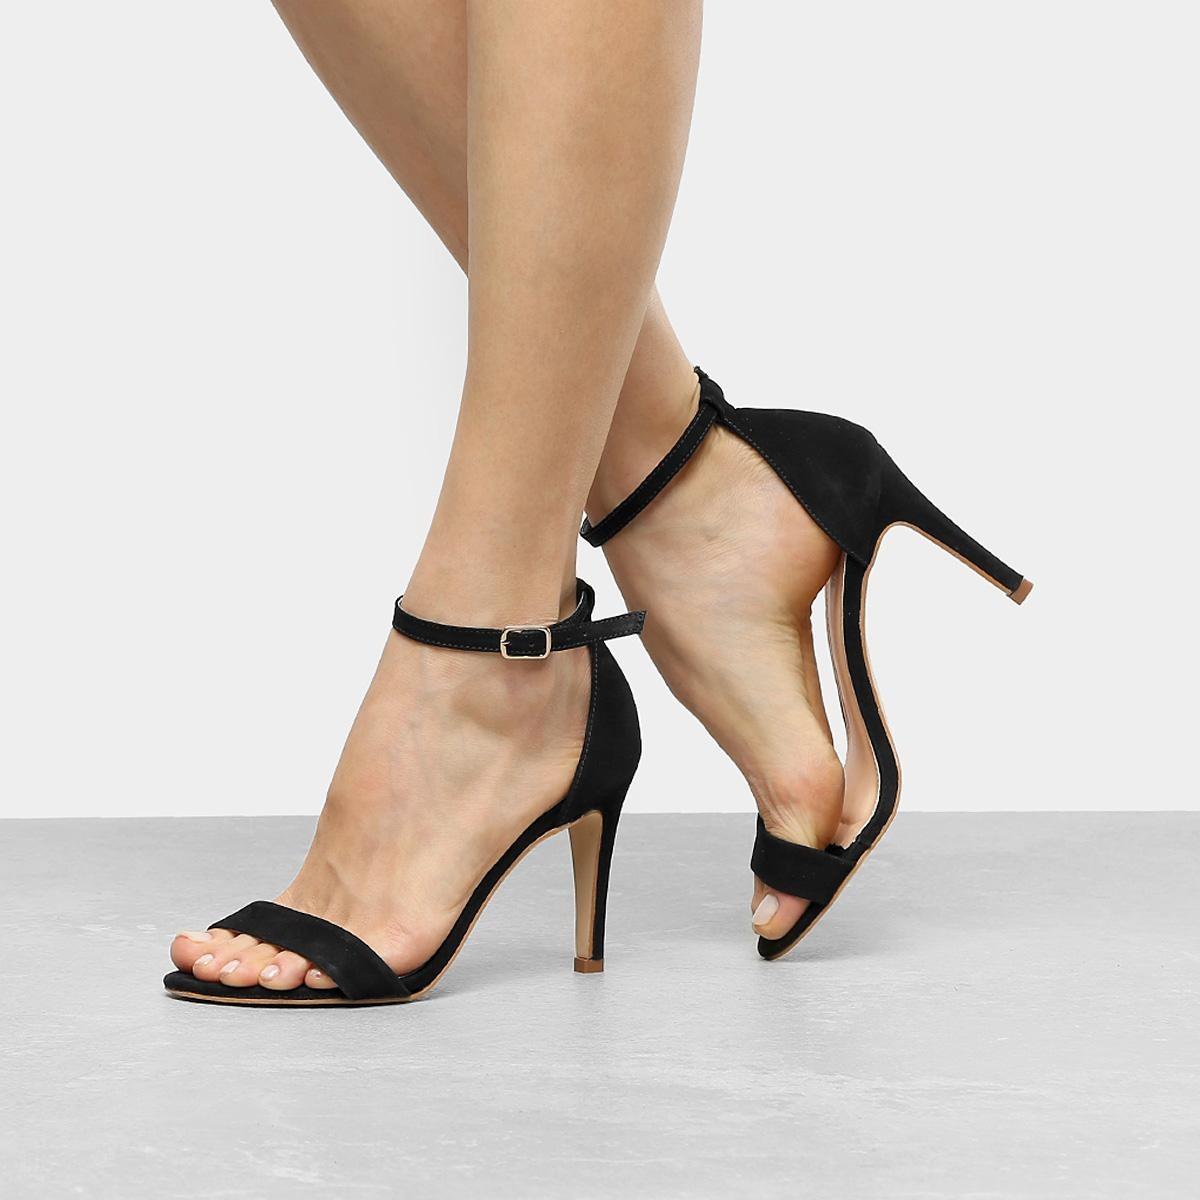 da473b11bf sandália couro shoestock salto fino naked feminina. Carregando zoom.